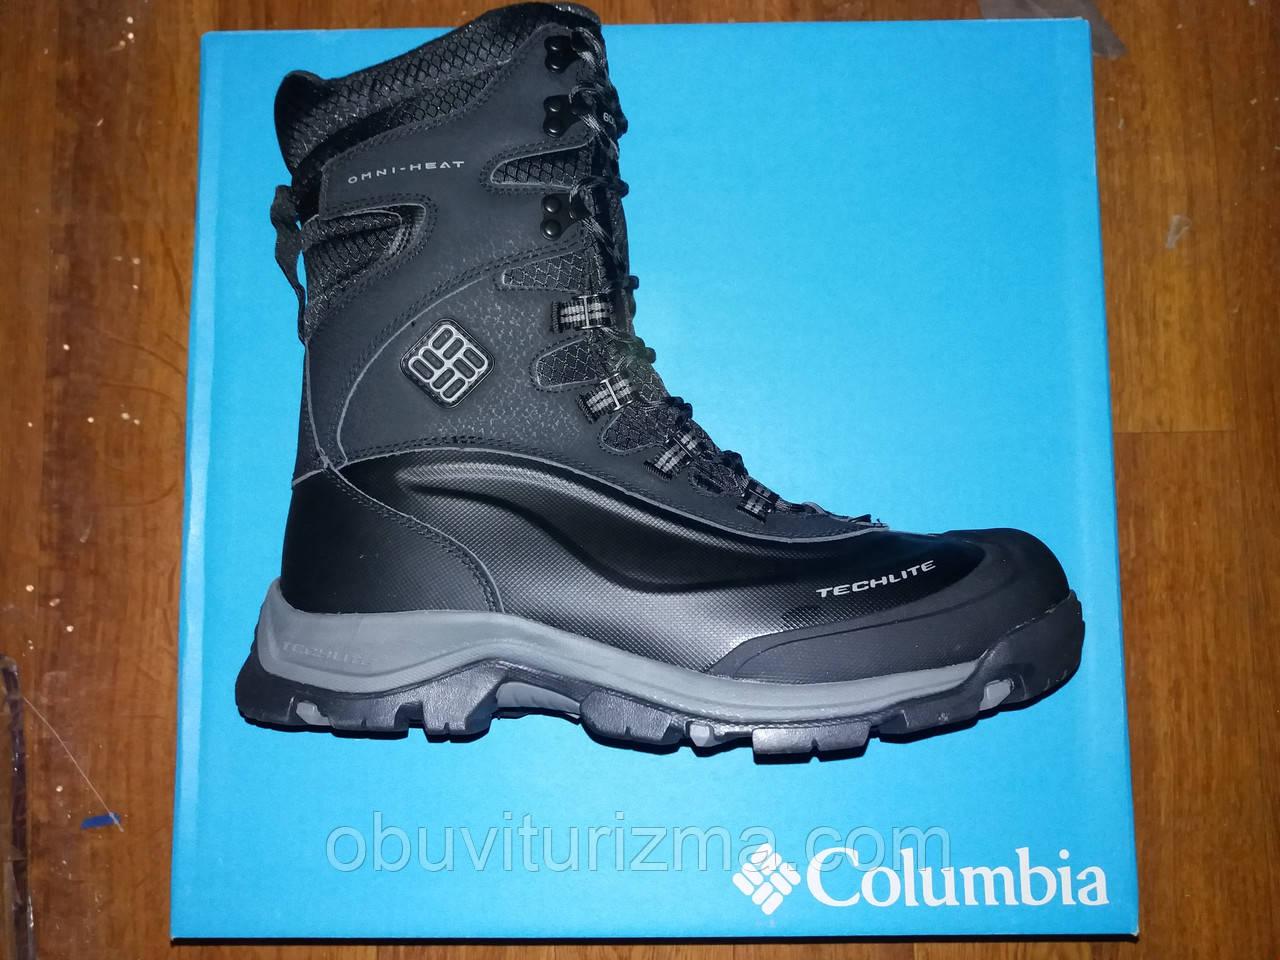 Columbia Sportswear Bugaboot Plus XTM 3 Omni-Heat dbf1a1e880b4b